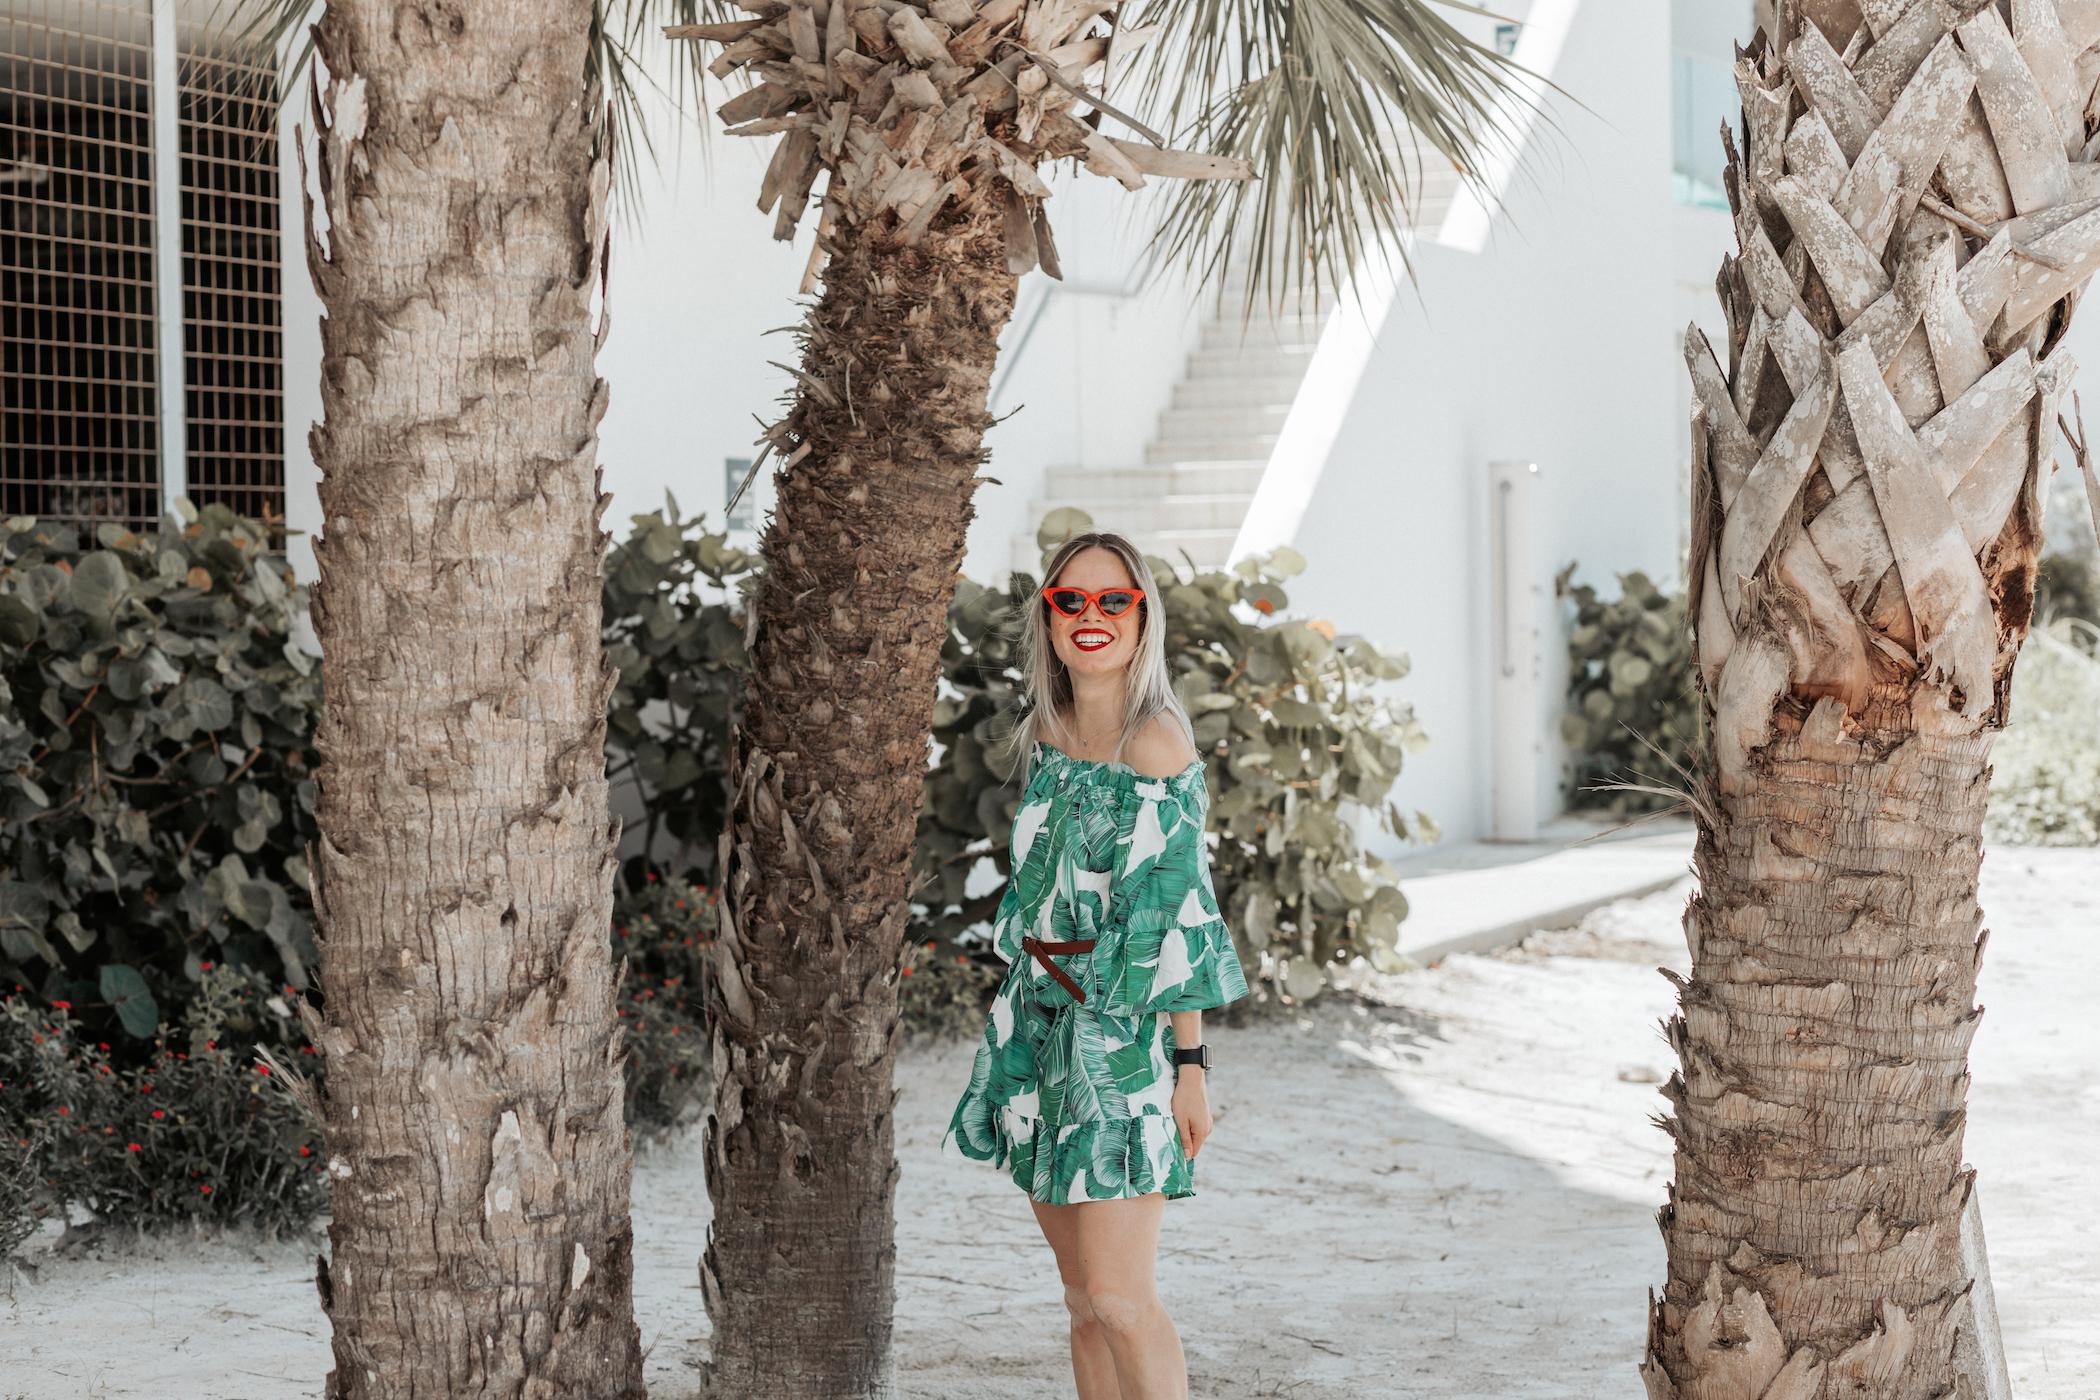 shadyveu-amazon-red-cateye-sunglasses-florida-tropical-ashlee-rose-photography-tiny-ashe-blog-V3.jpg